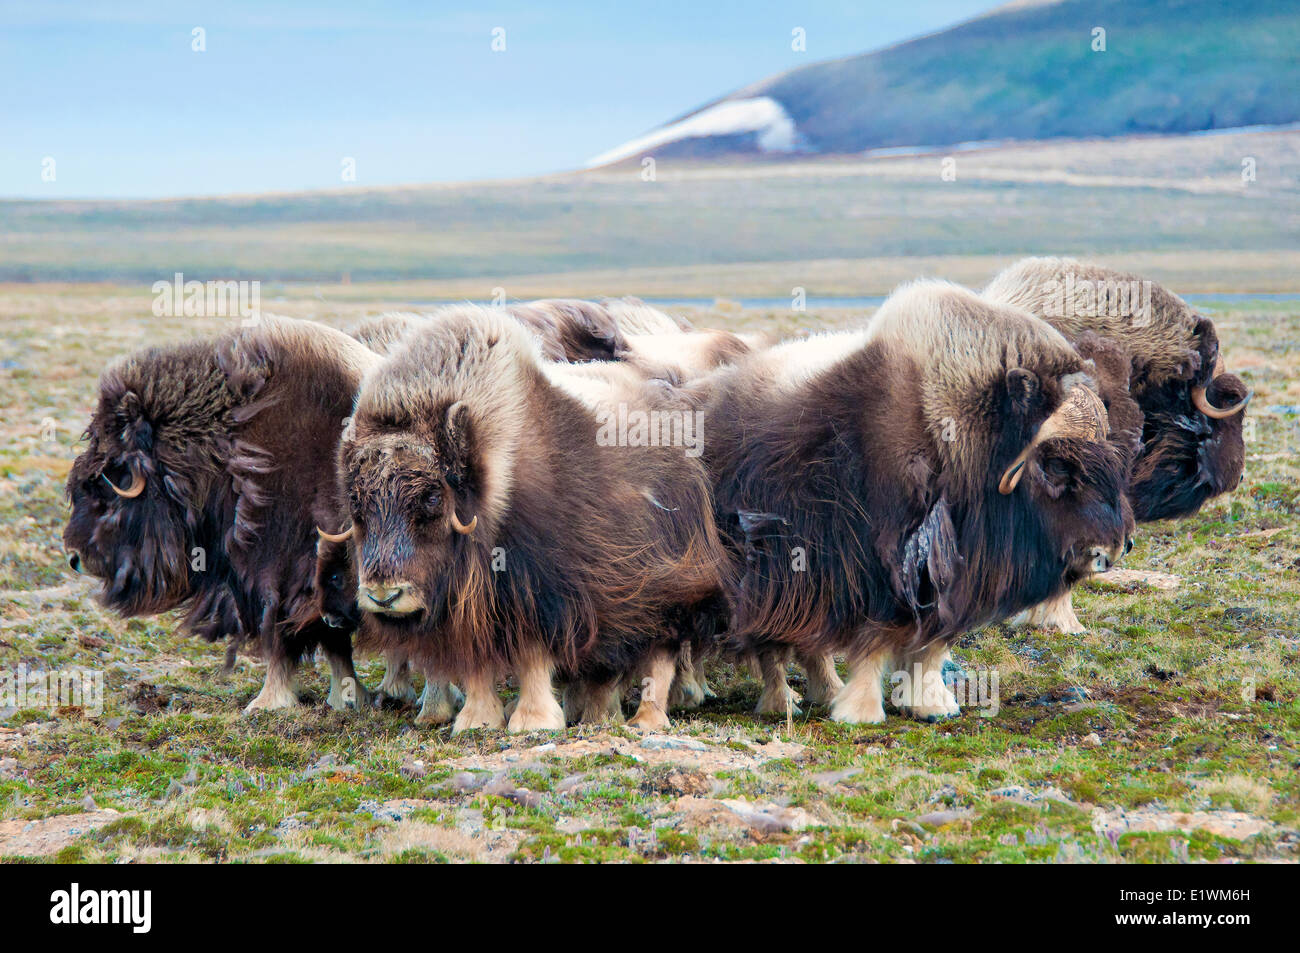 Muskoxen (Ovibos moschatus) herd, Victoria Island, Nunavut, Arctic Canada - Stock Image